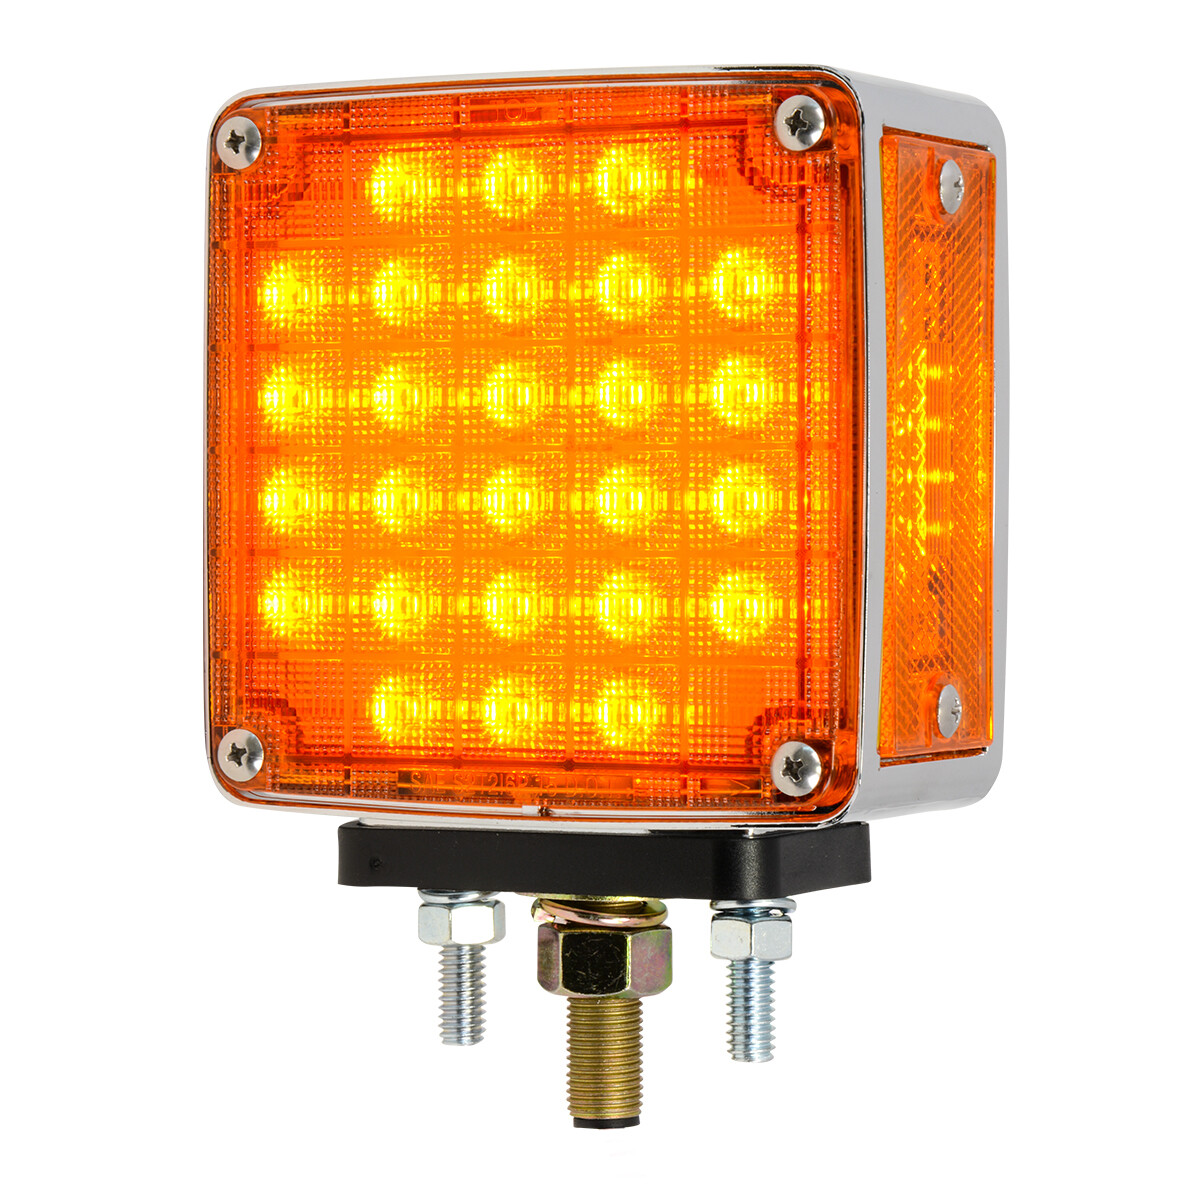 Square Double Face Smart Dynamic LED Pedestal Lights